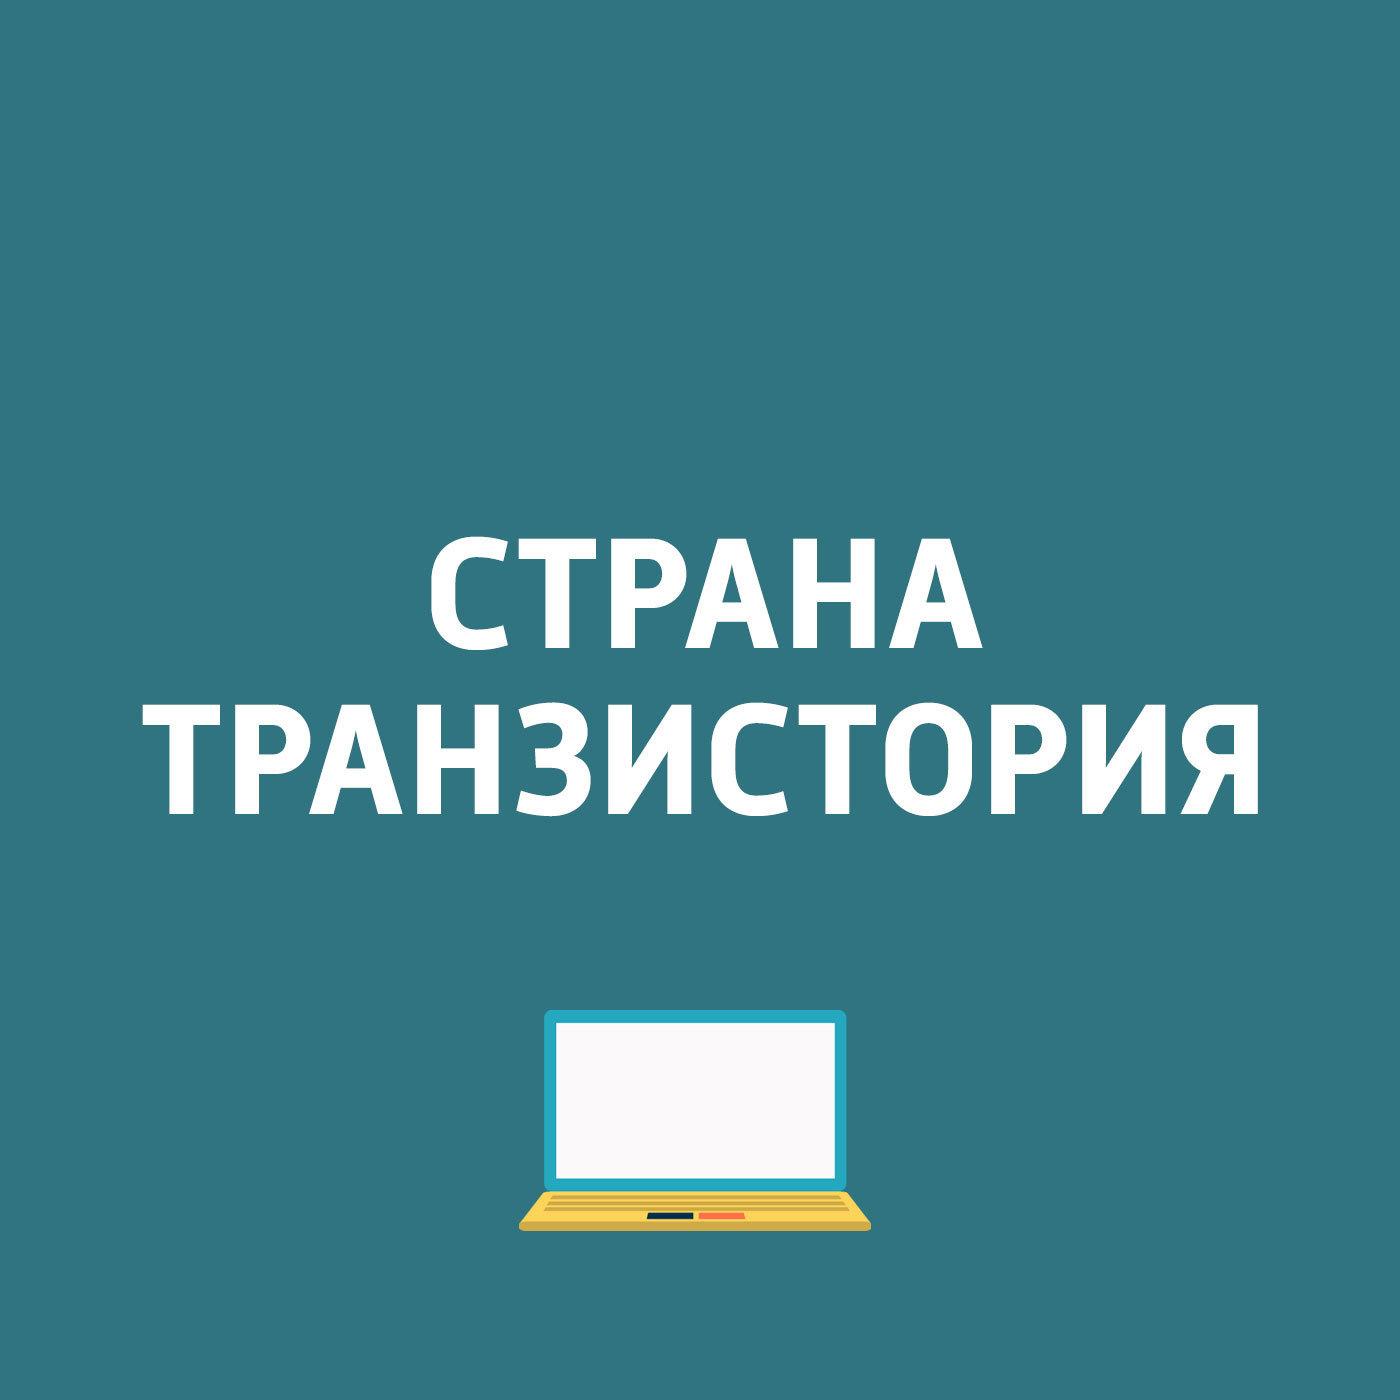 Картаев Павел Новинки от компании Lenovo... the elder scrolls online morrowind игра для ps4